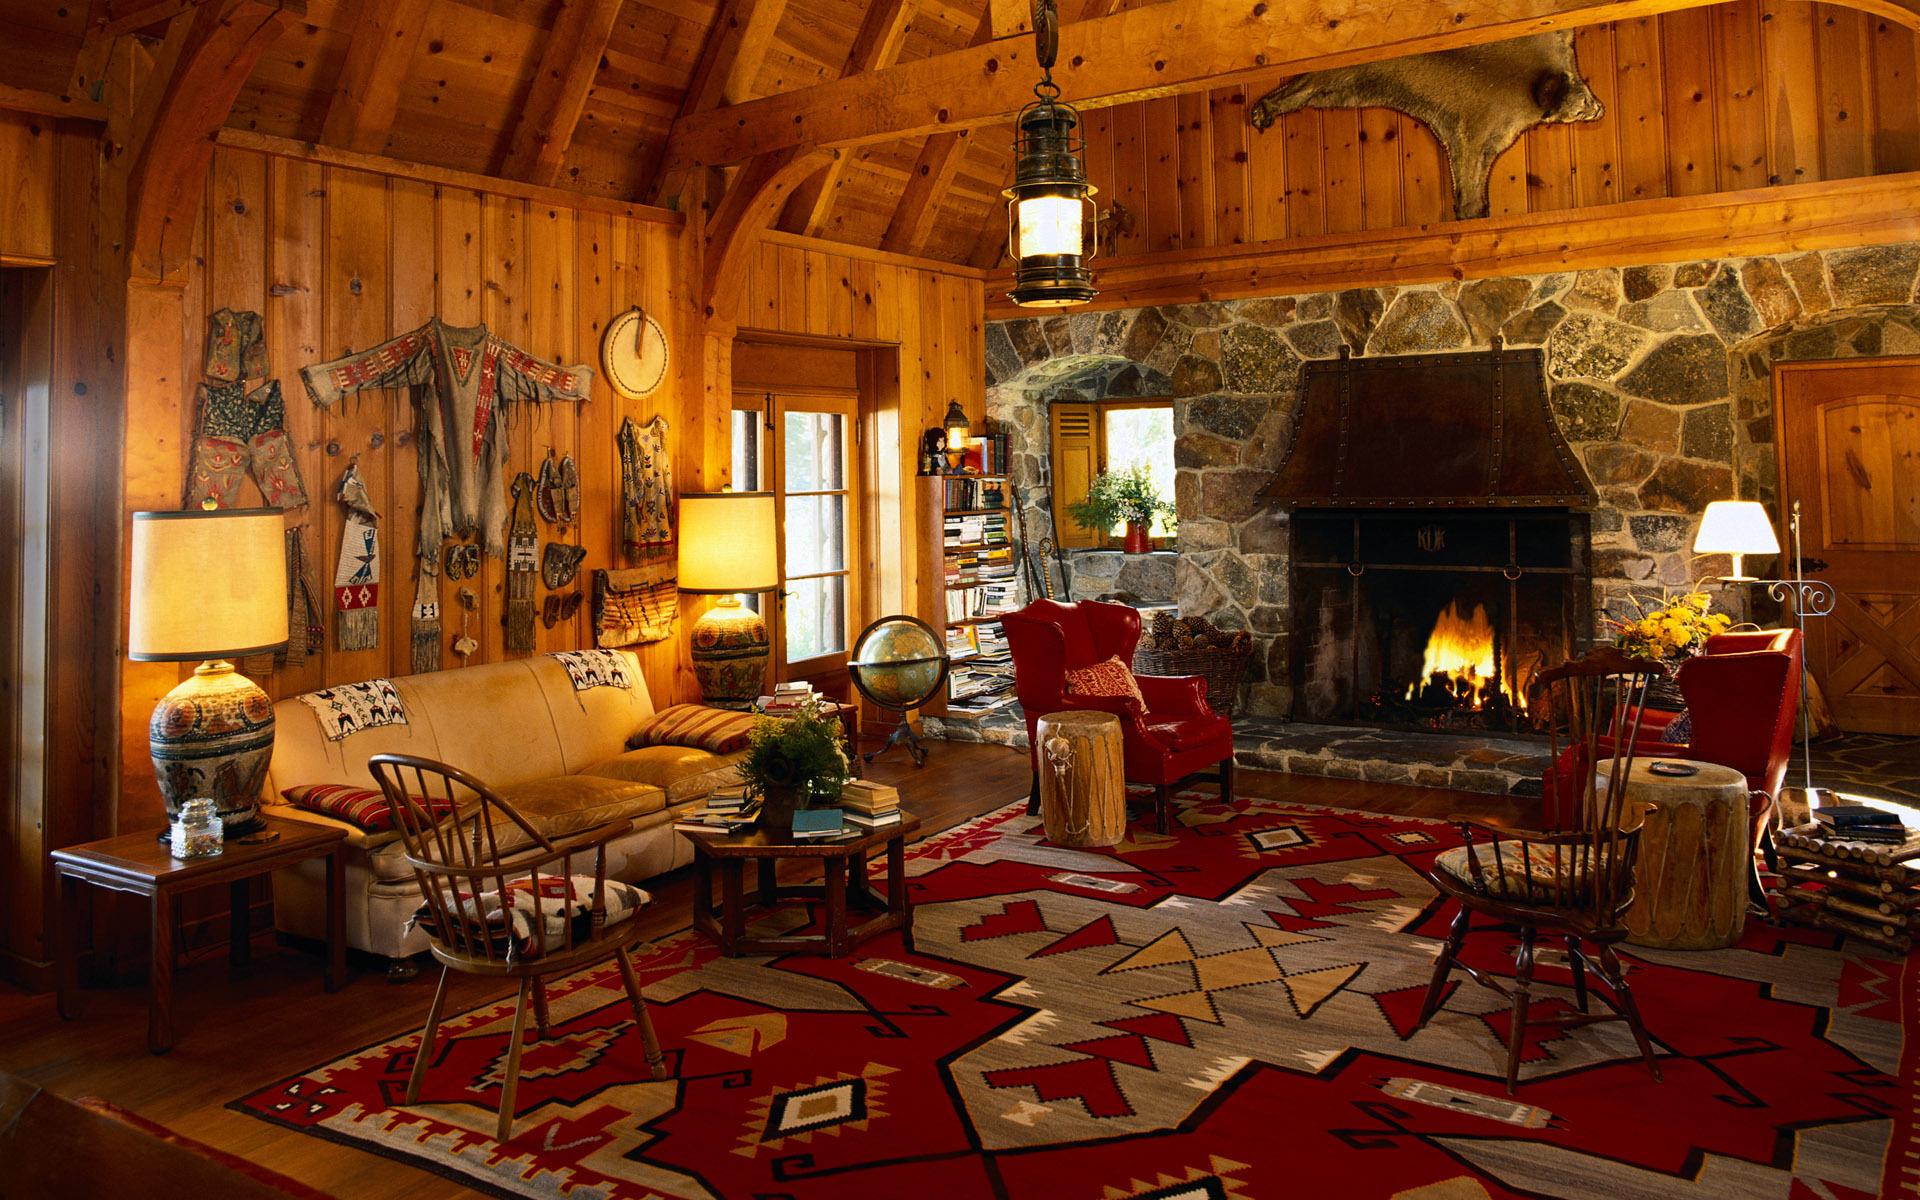 Log Cabin Christmas Wallpaper Wallpapersafari Fireplace Live